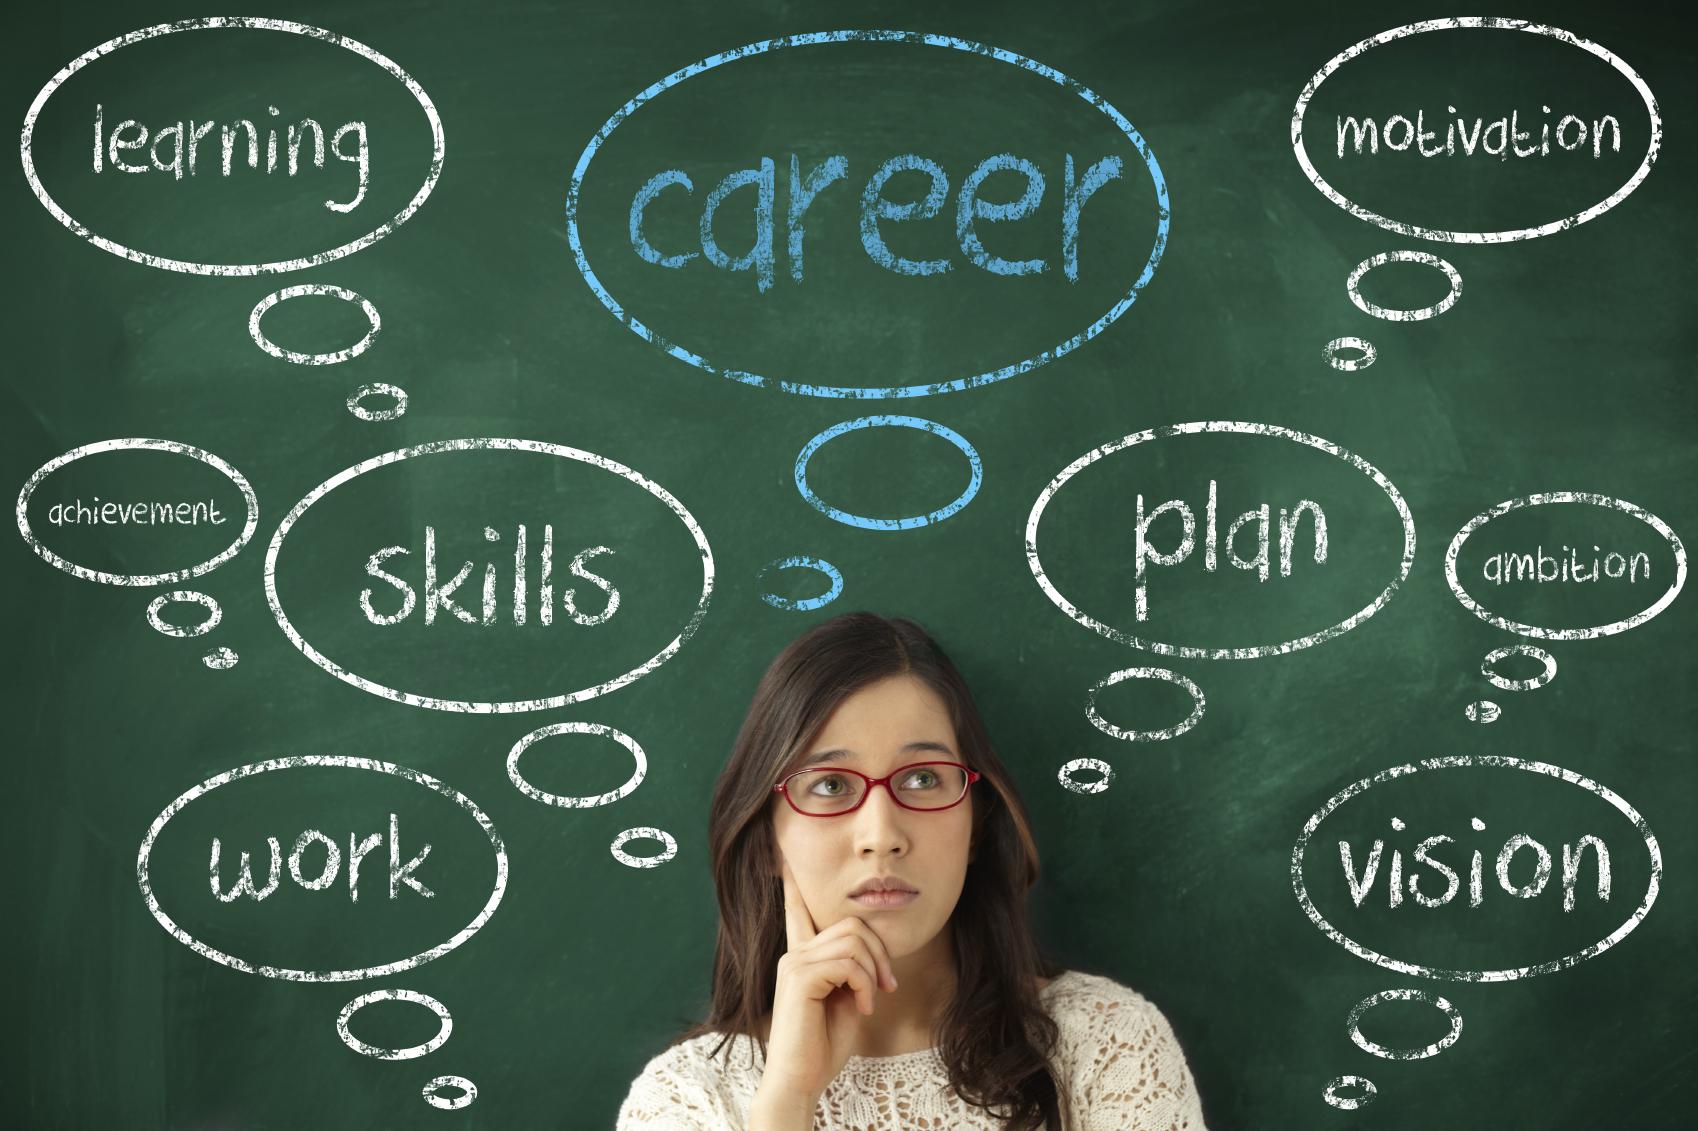 Careers in Psychology | CareersinPsychology.org